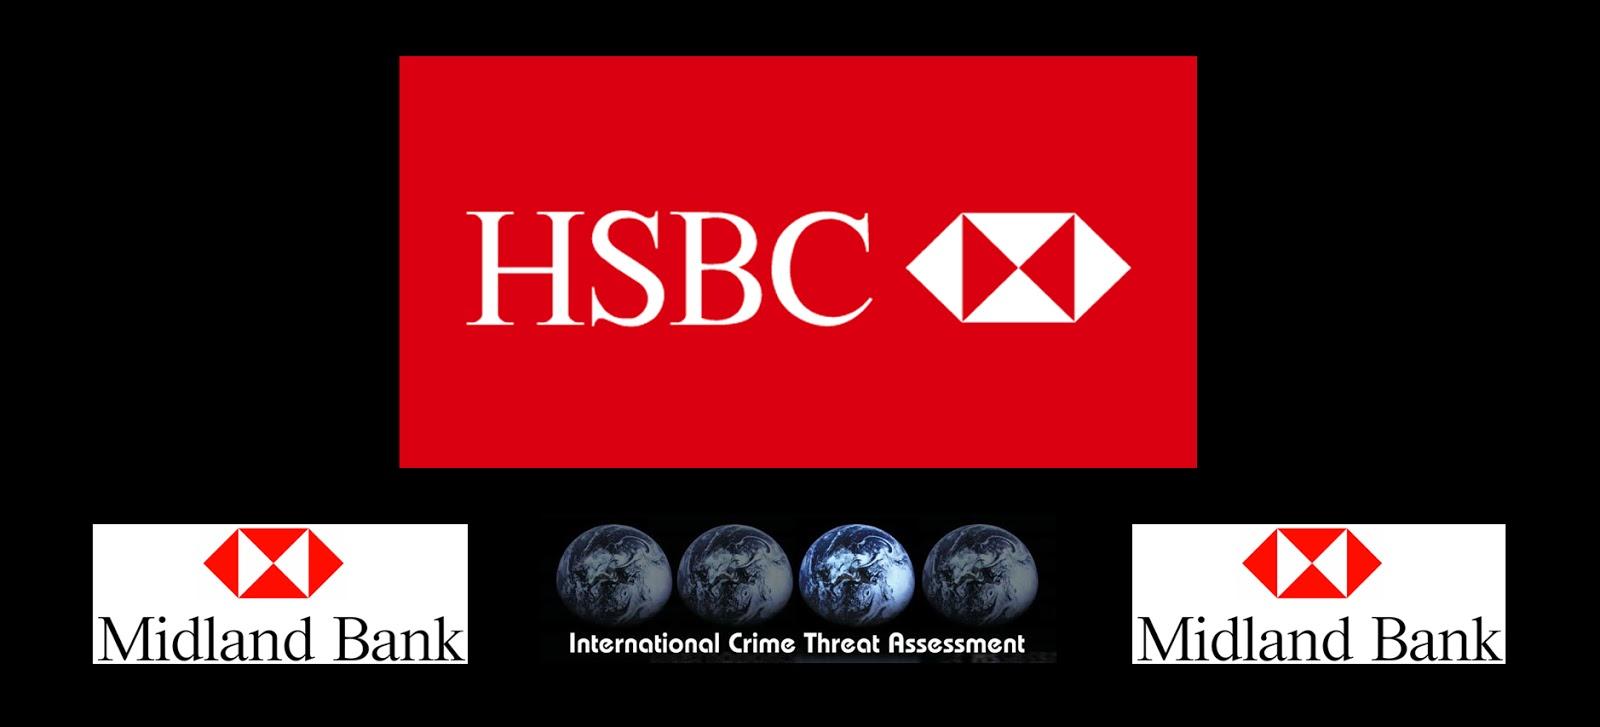 HSBC Chairman Mark Tucker * LOCKDOWN * IRS HMRC Biggest